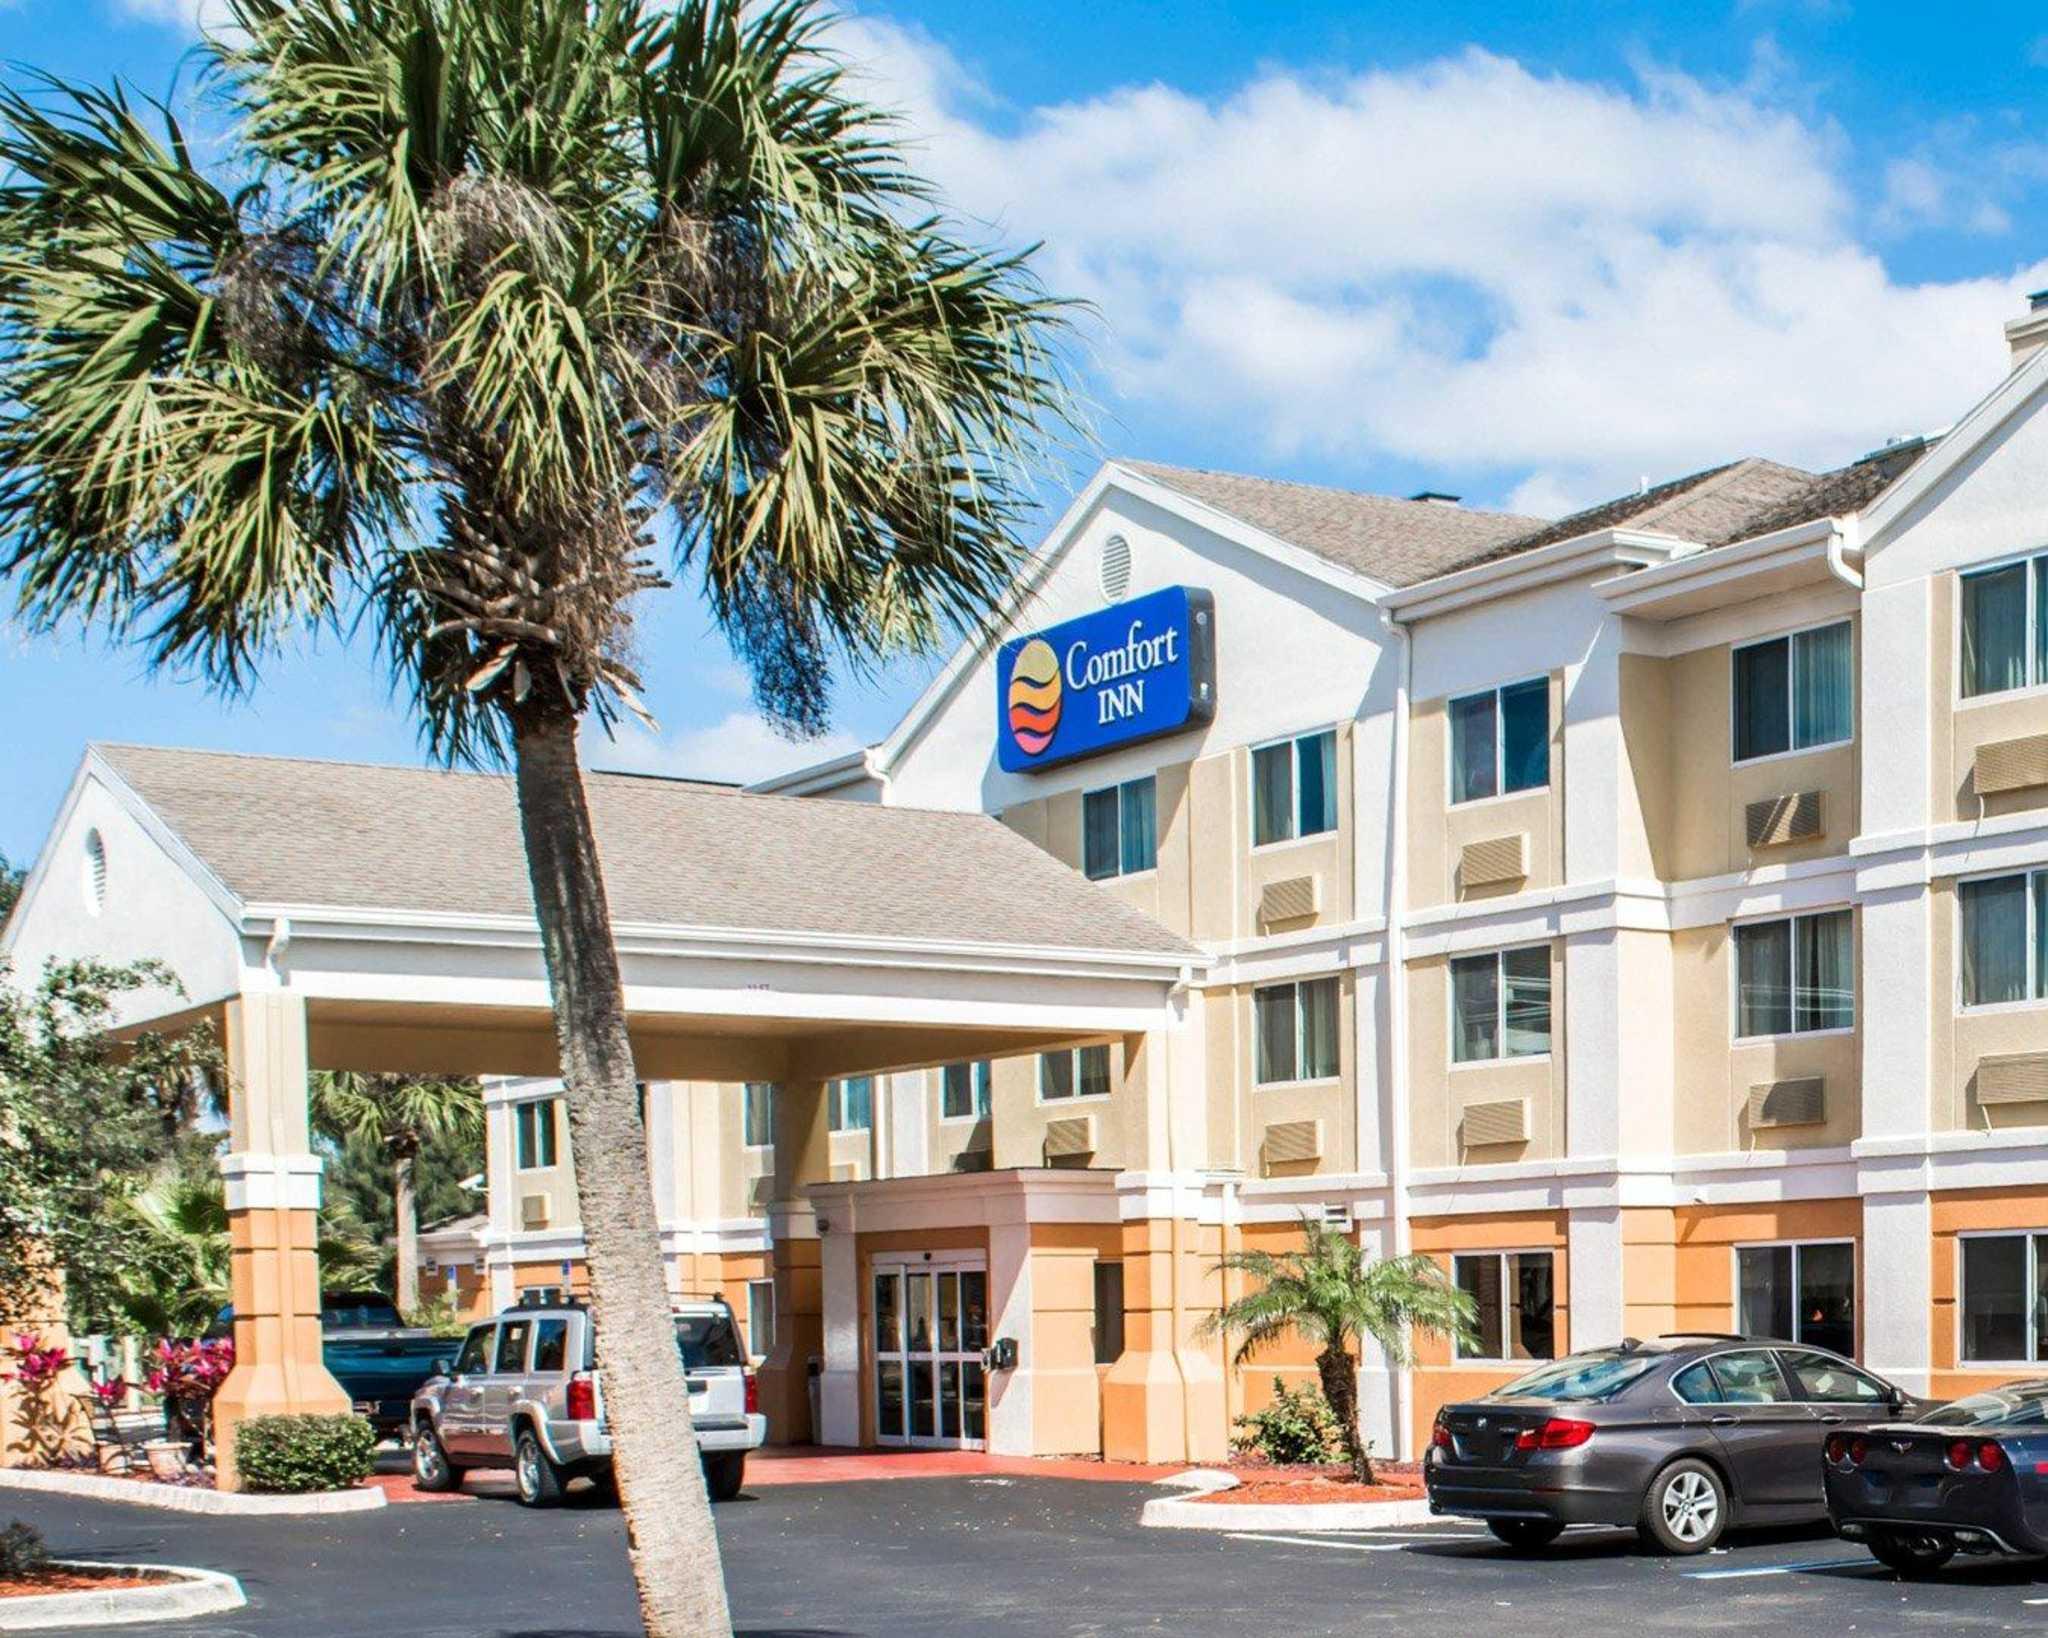 Comfort Inn Fort Myers Northeast image 0